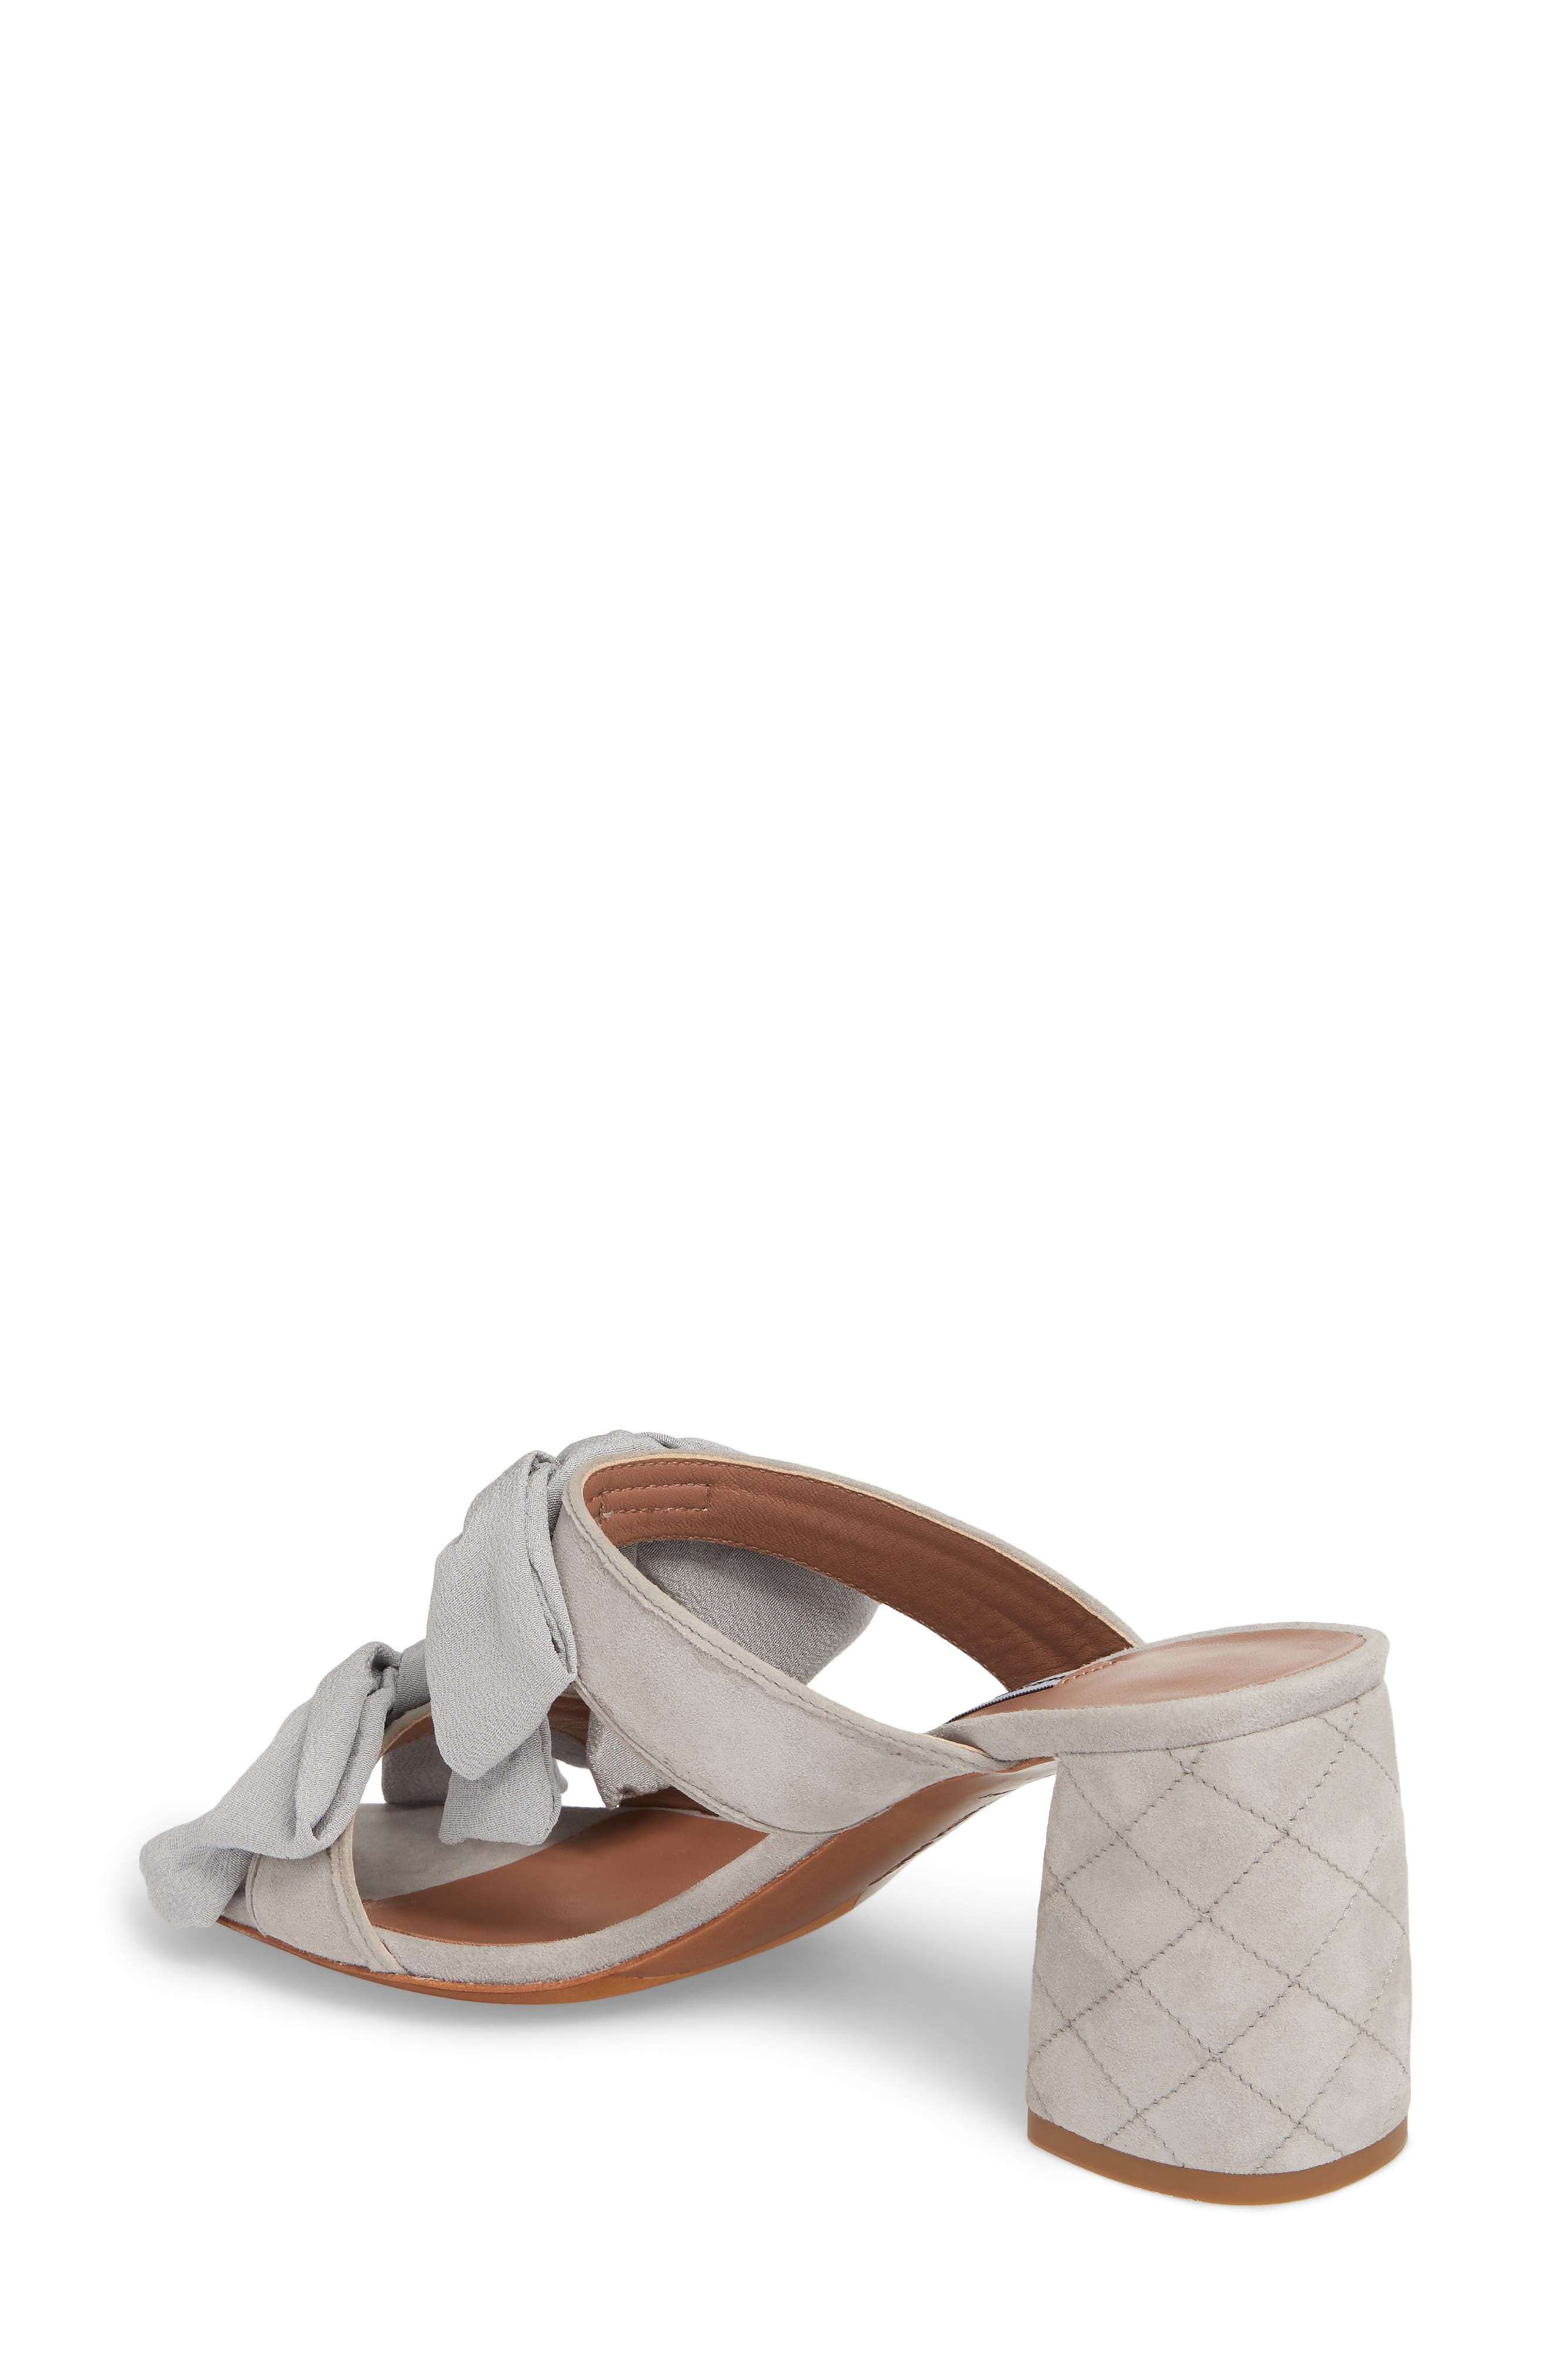 Barbi Bow Sandal,                             Alternate thumbnail 3, color,